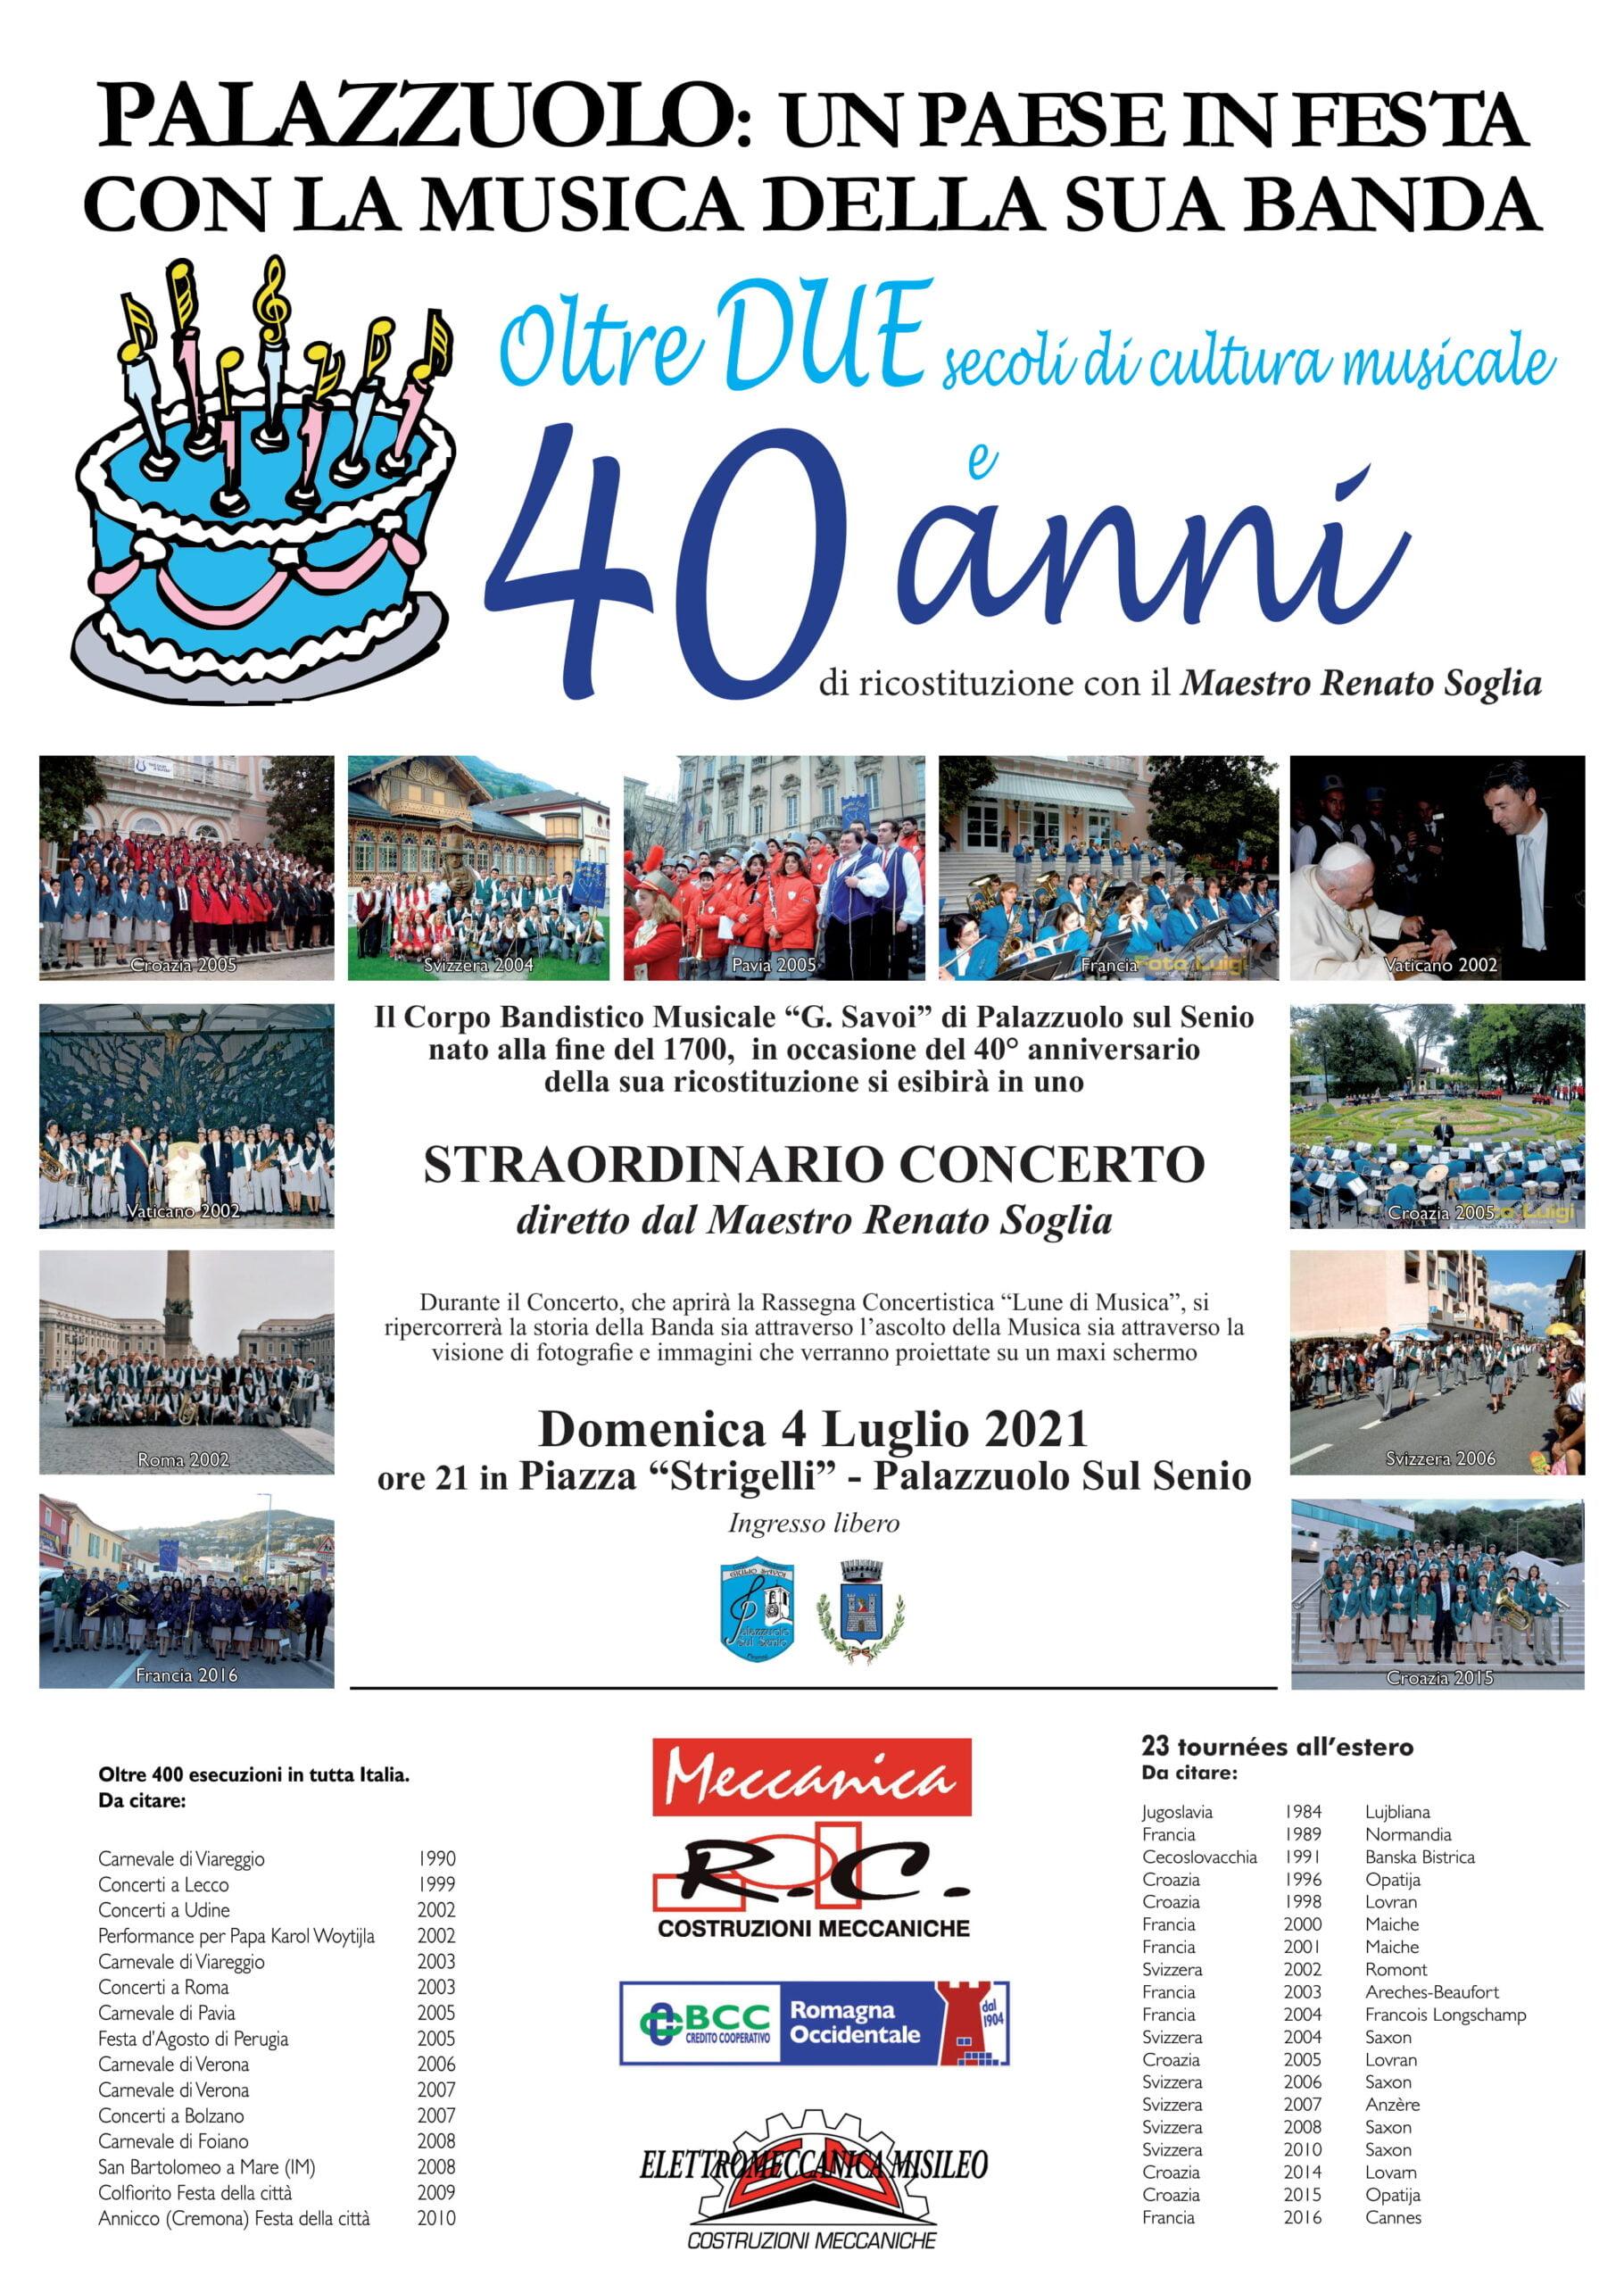 200 Anni di Musica 40 anni